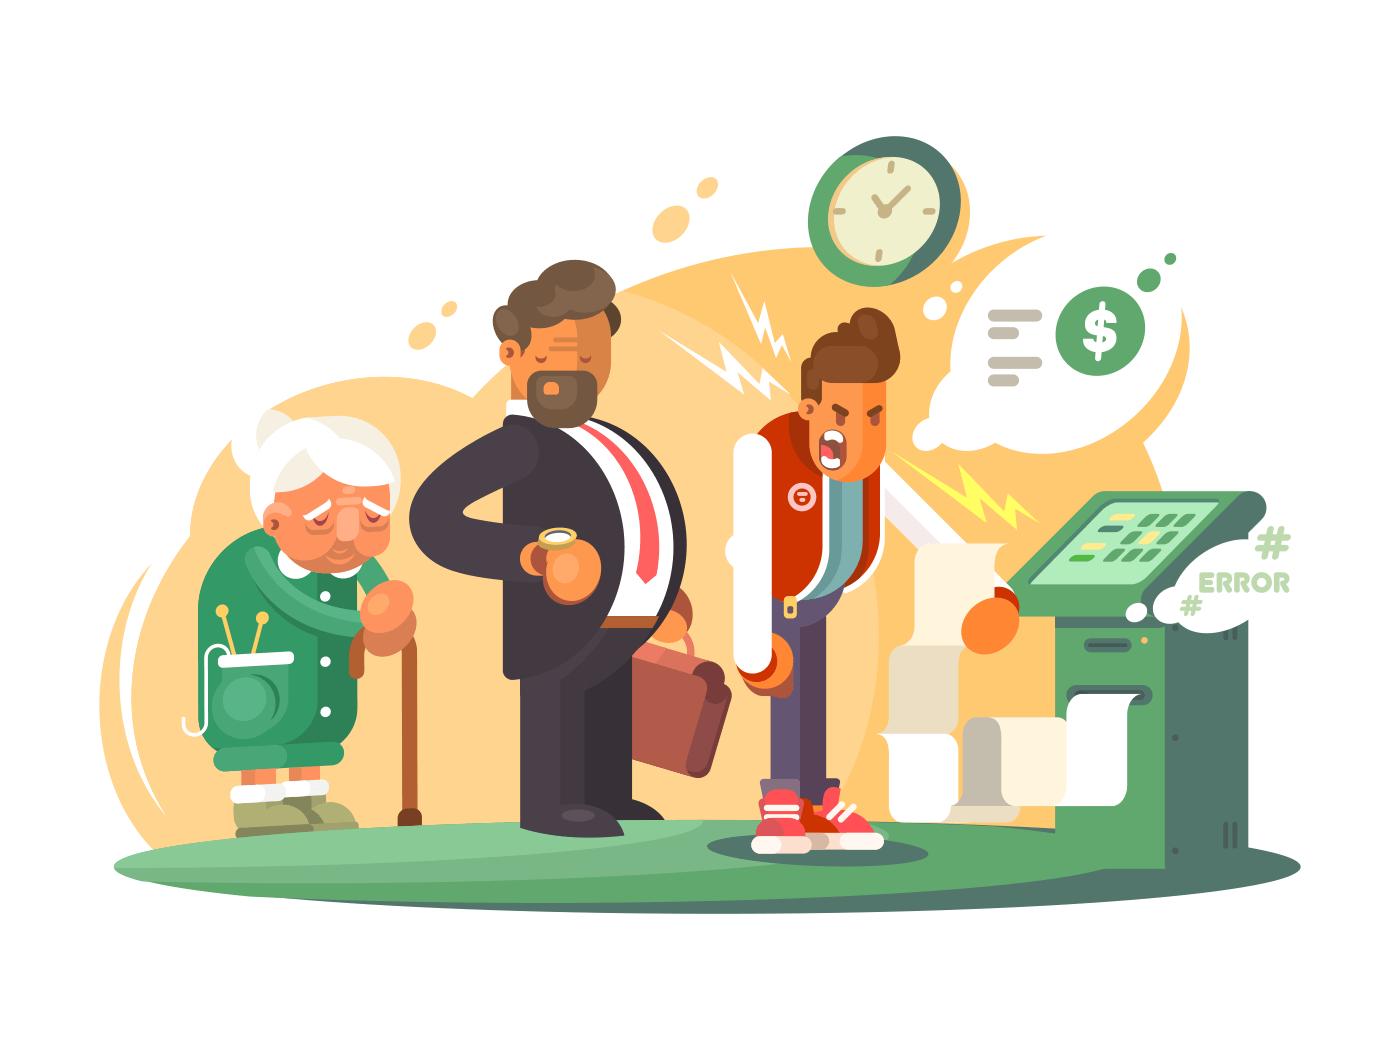 Bad service at bank illustration